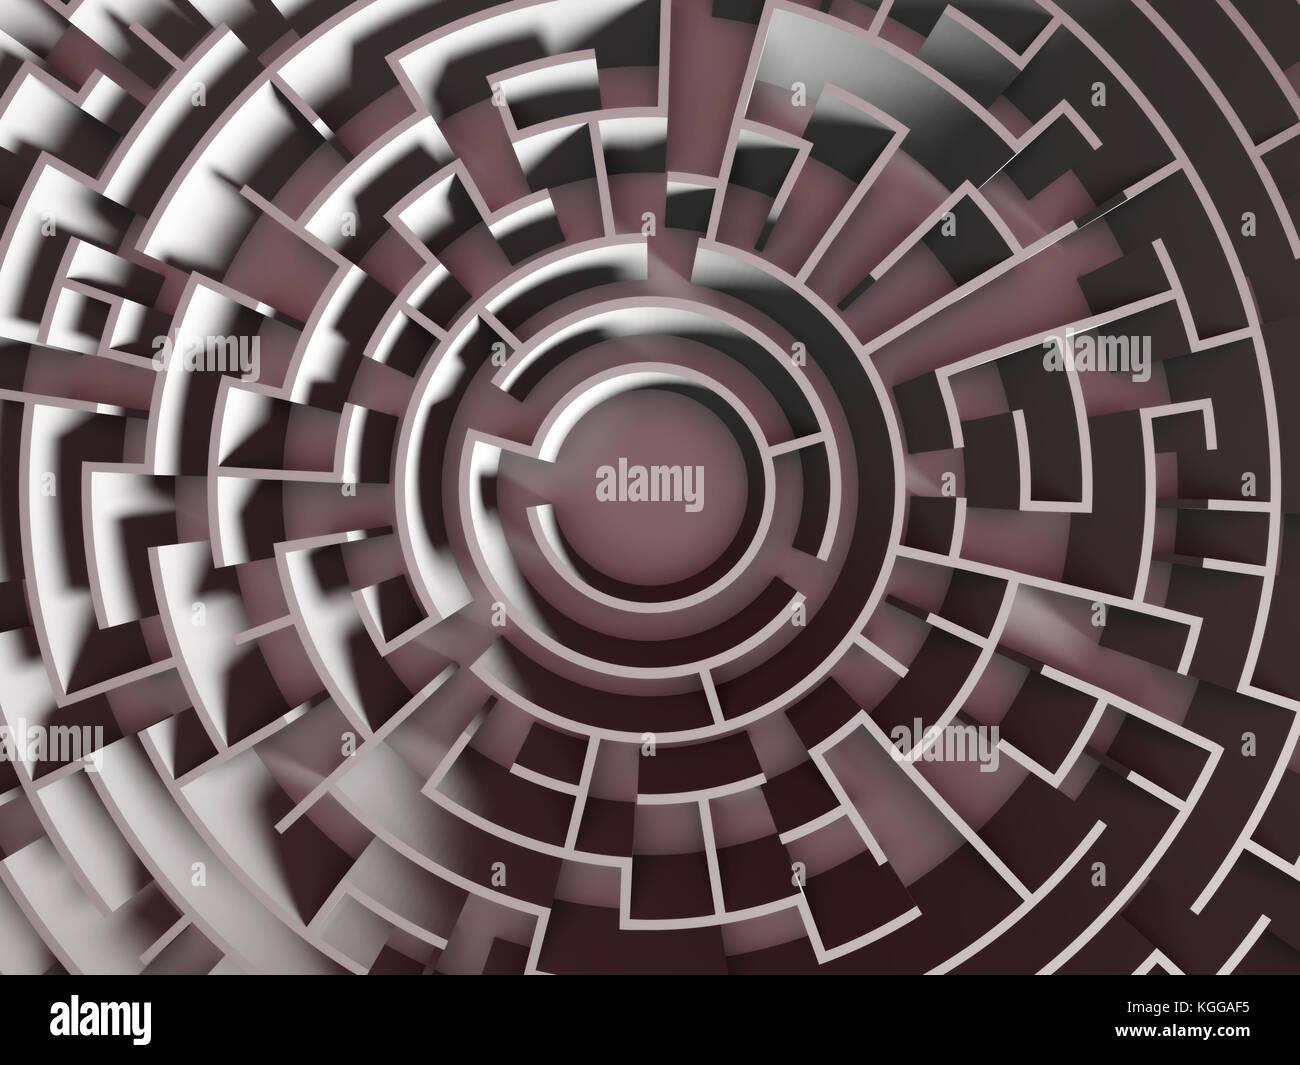 huge circular maze structure (3d illustration) - Stock Image